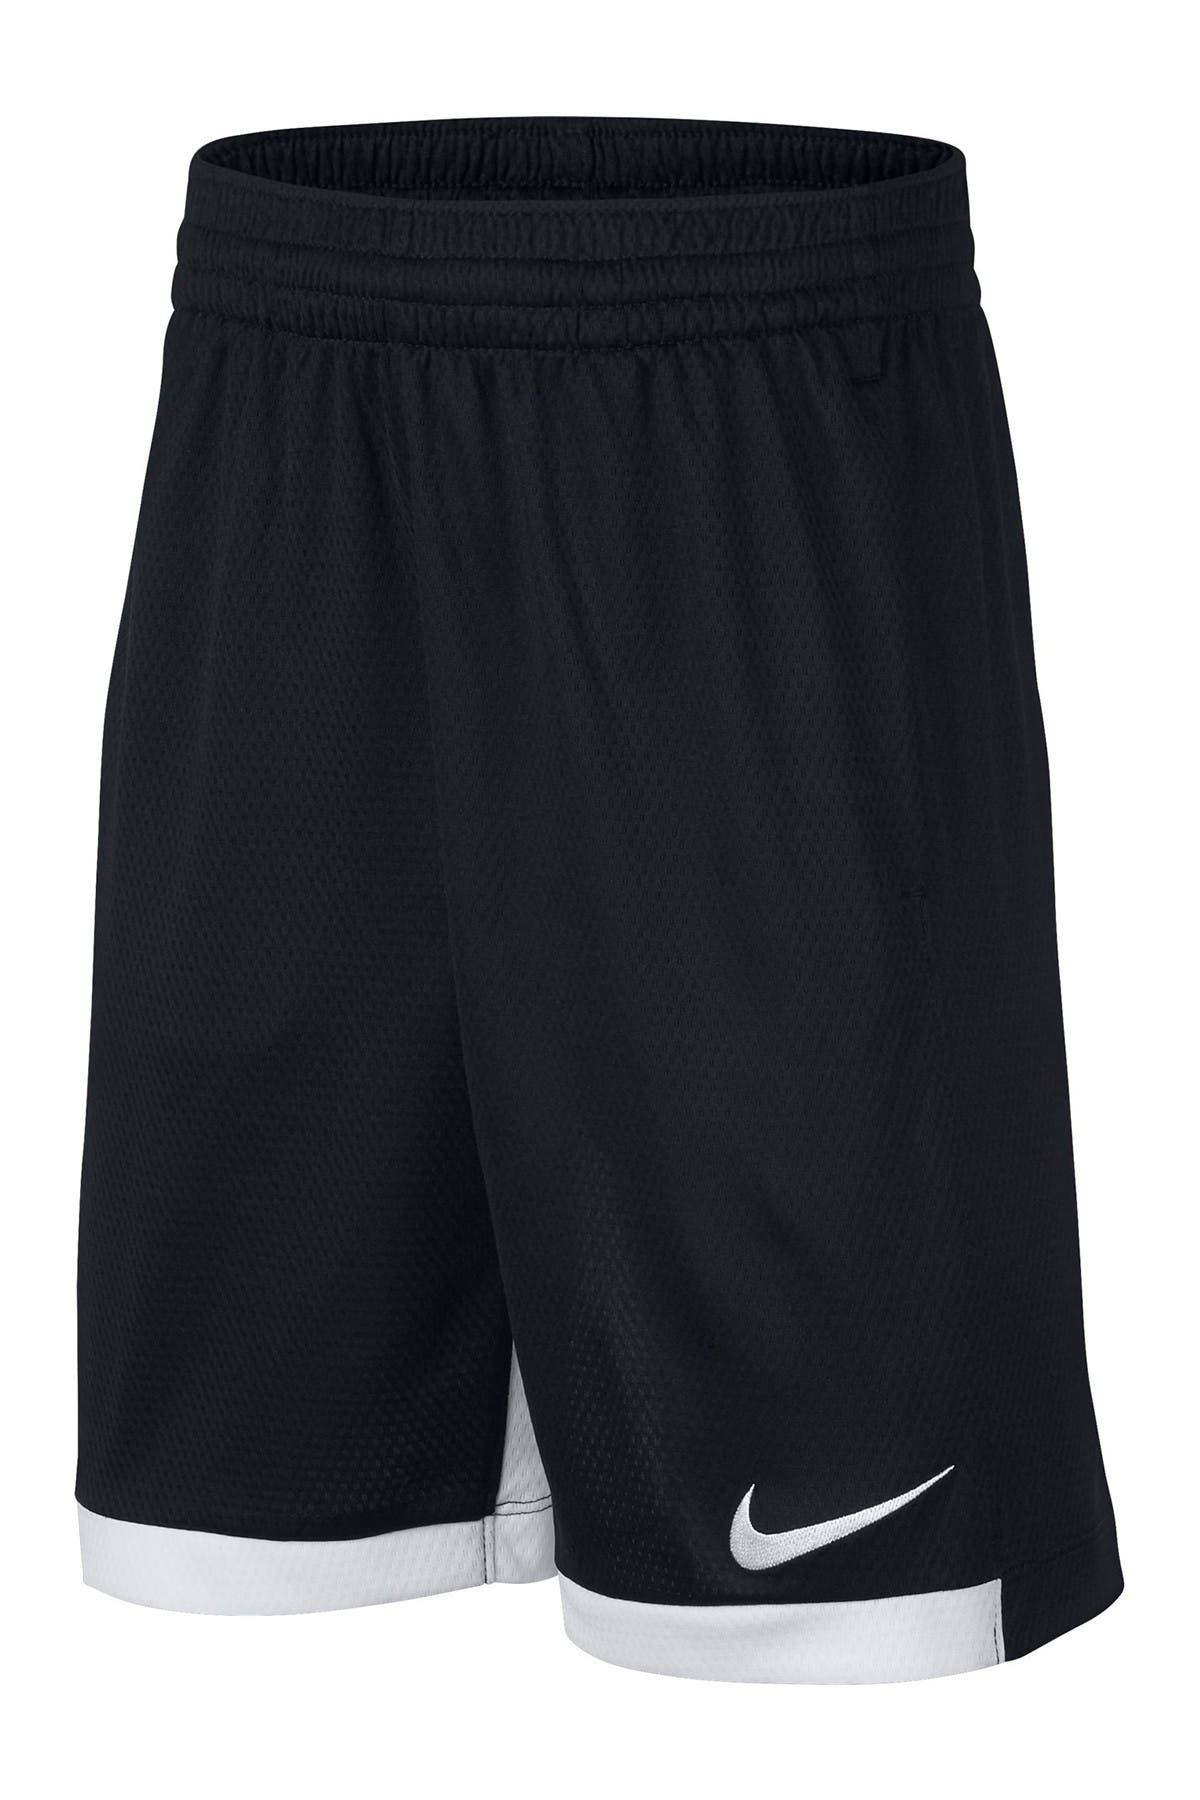 Image of Nike Dri-FIT Trophy Training Shorts